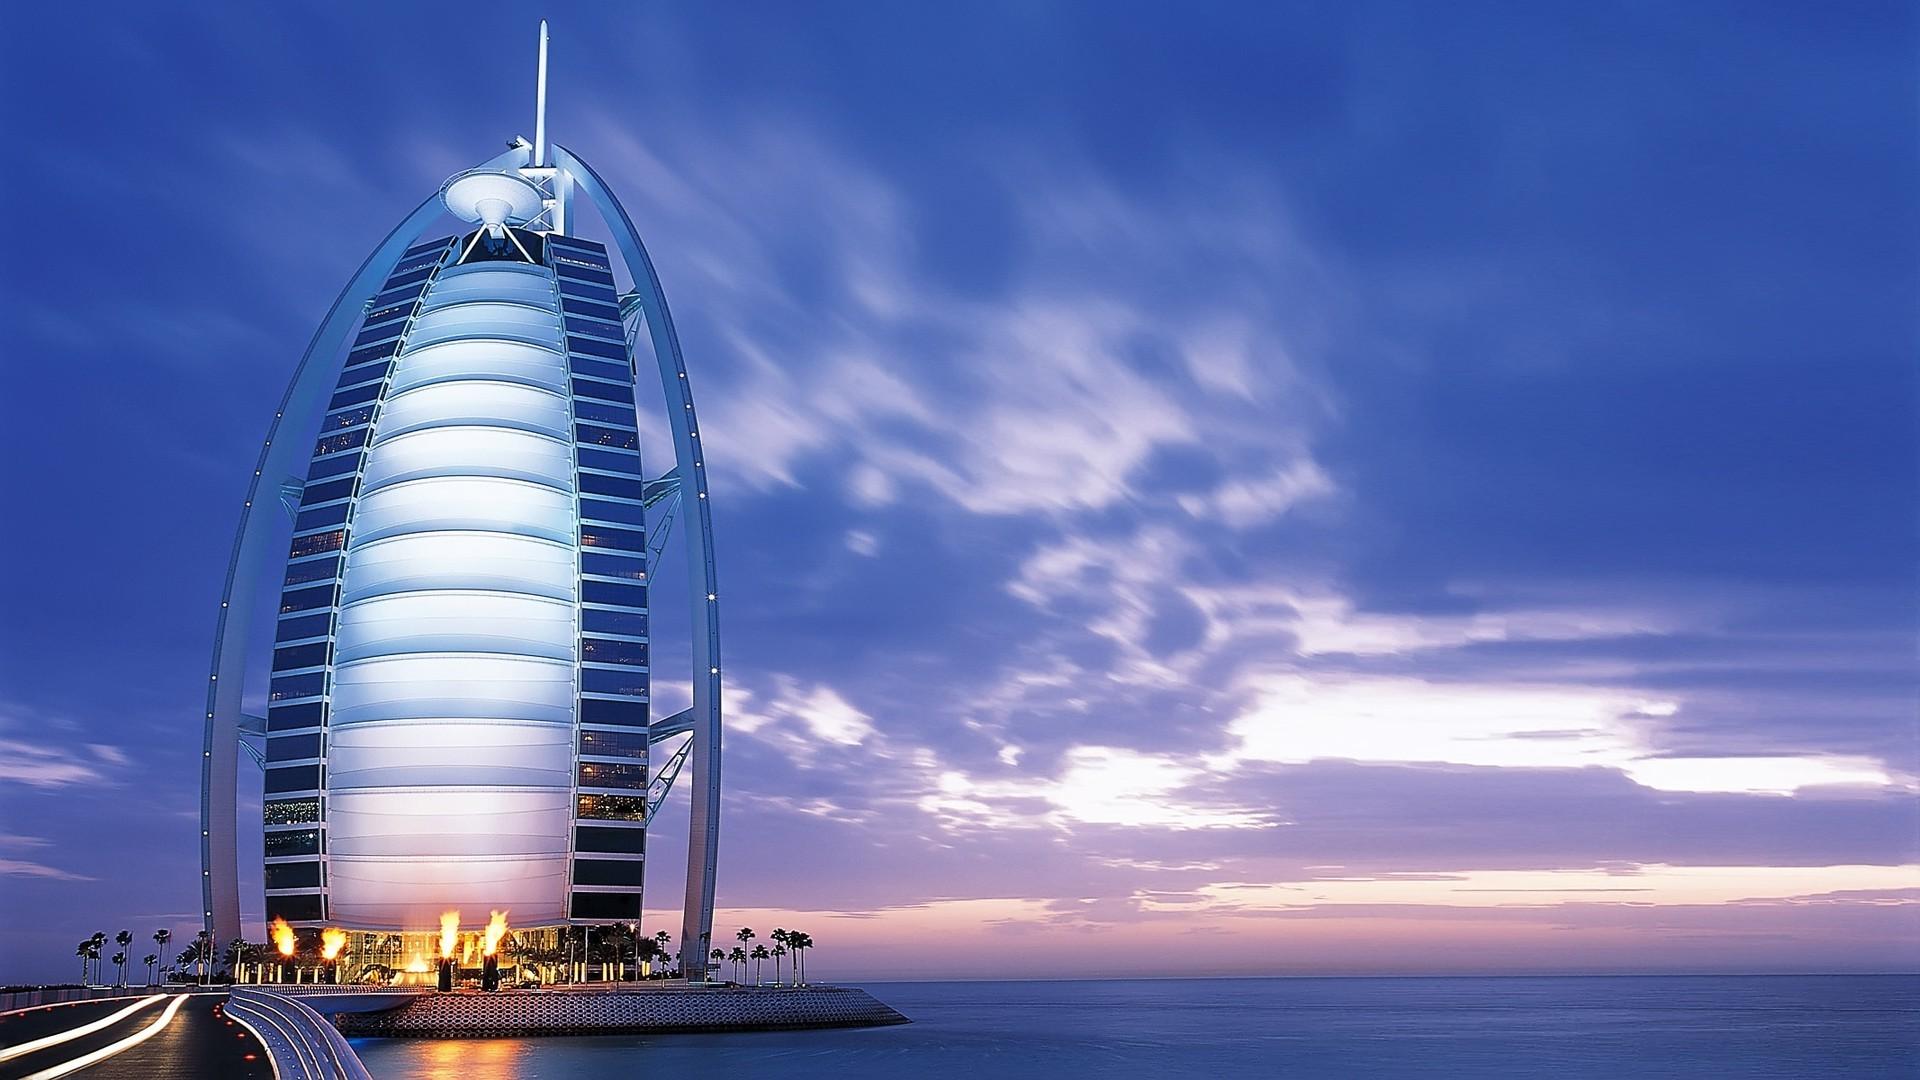 wallpaper : sea, city, cityscape, urban, building, reflection, sky